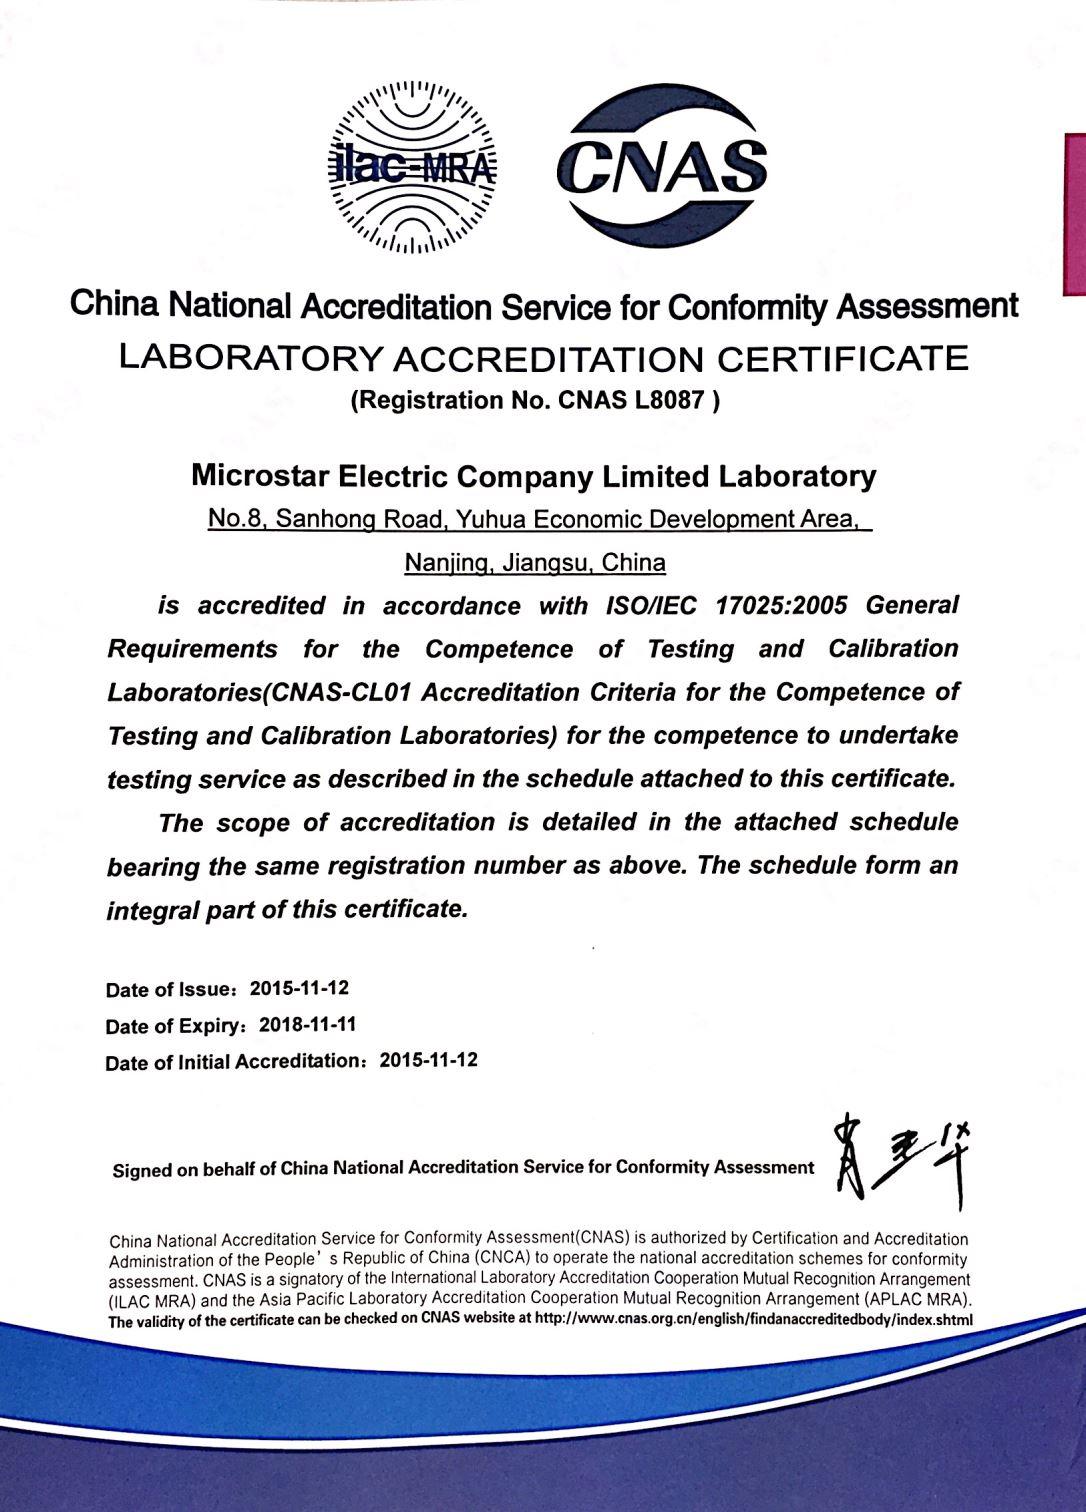 Microstar IEC17025 Laboratory Accreditation (CNAS) Certificate